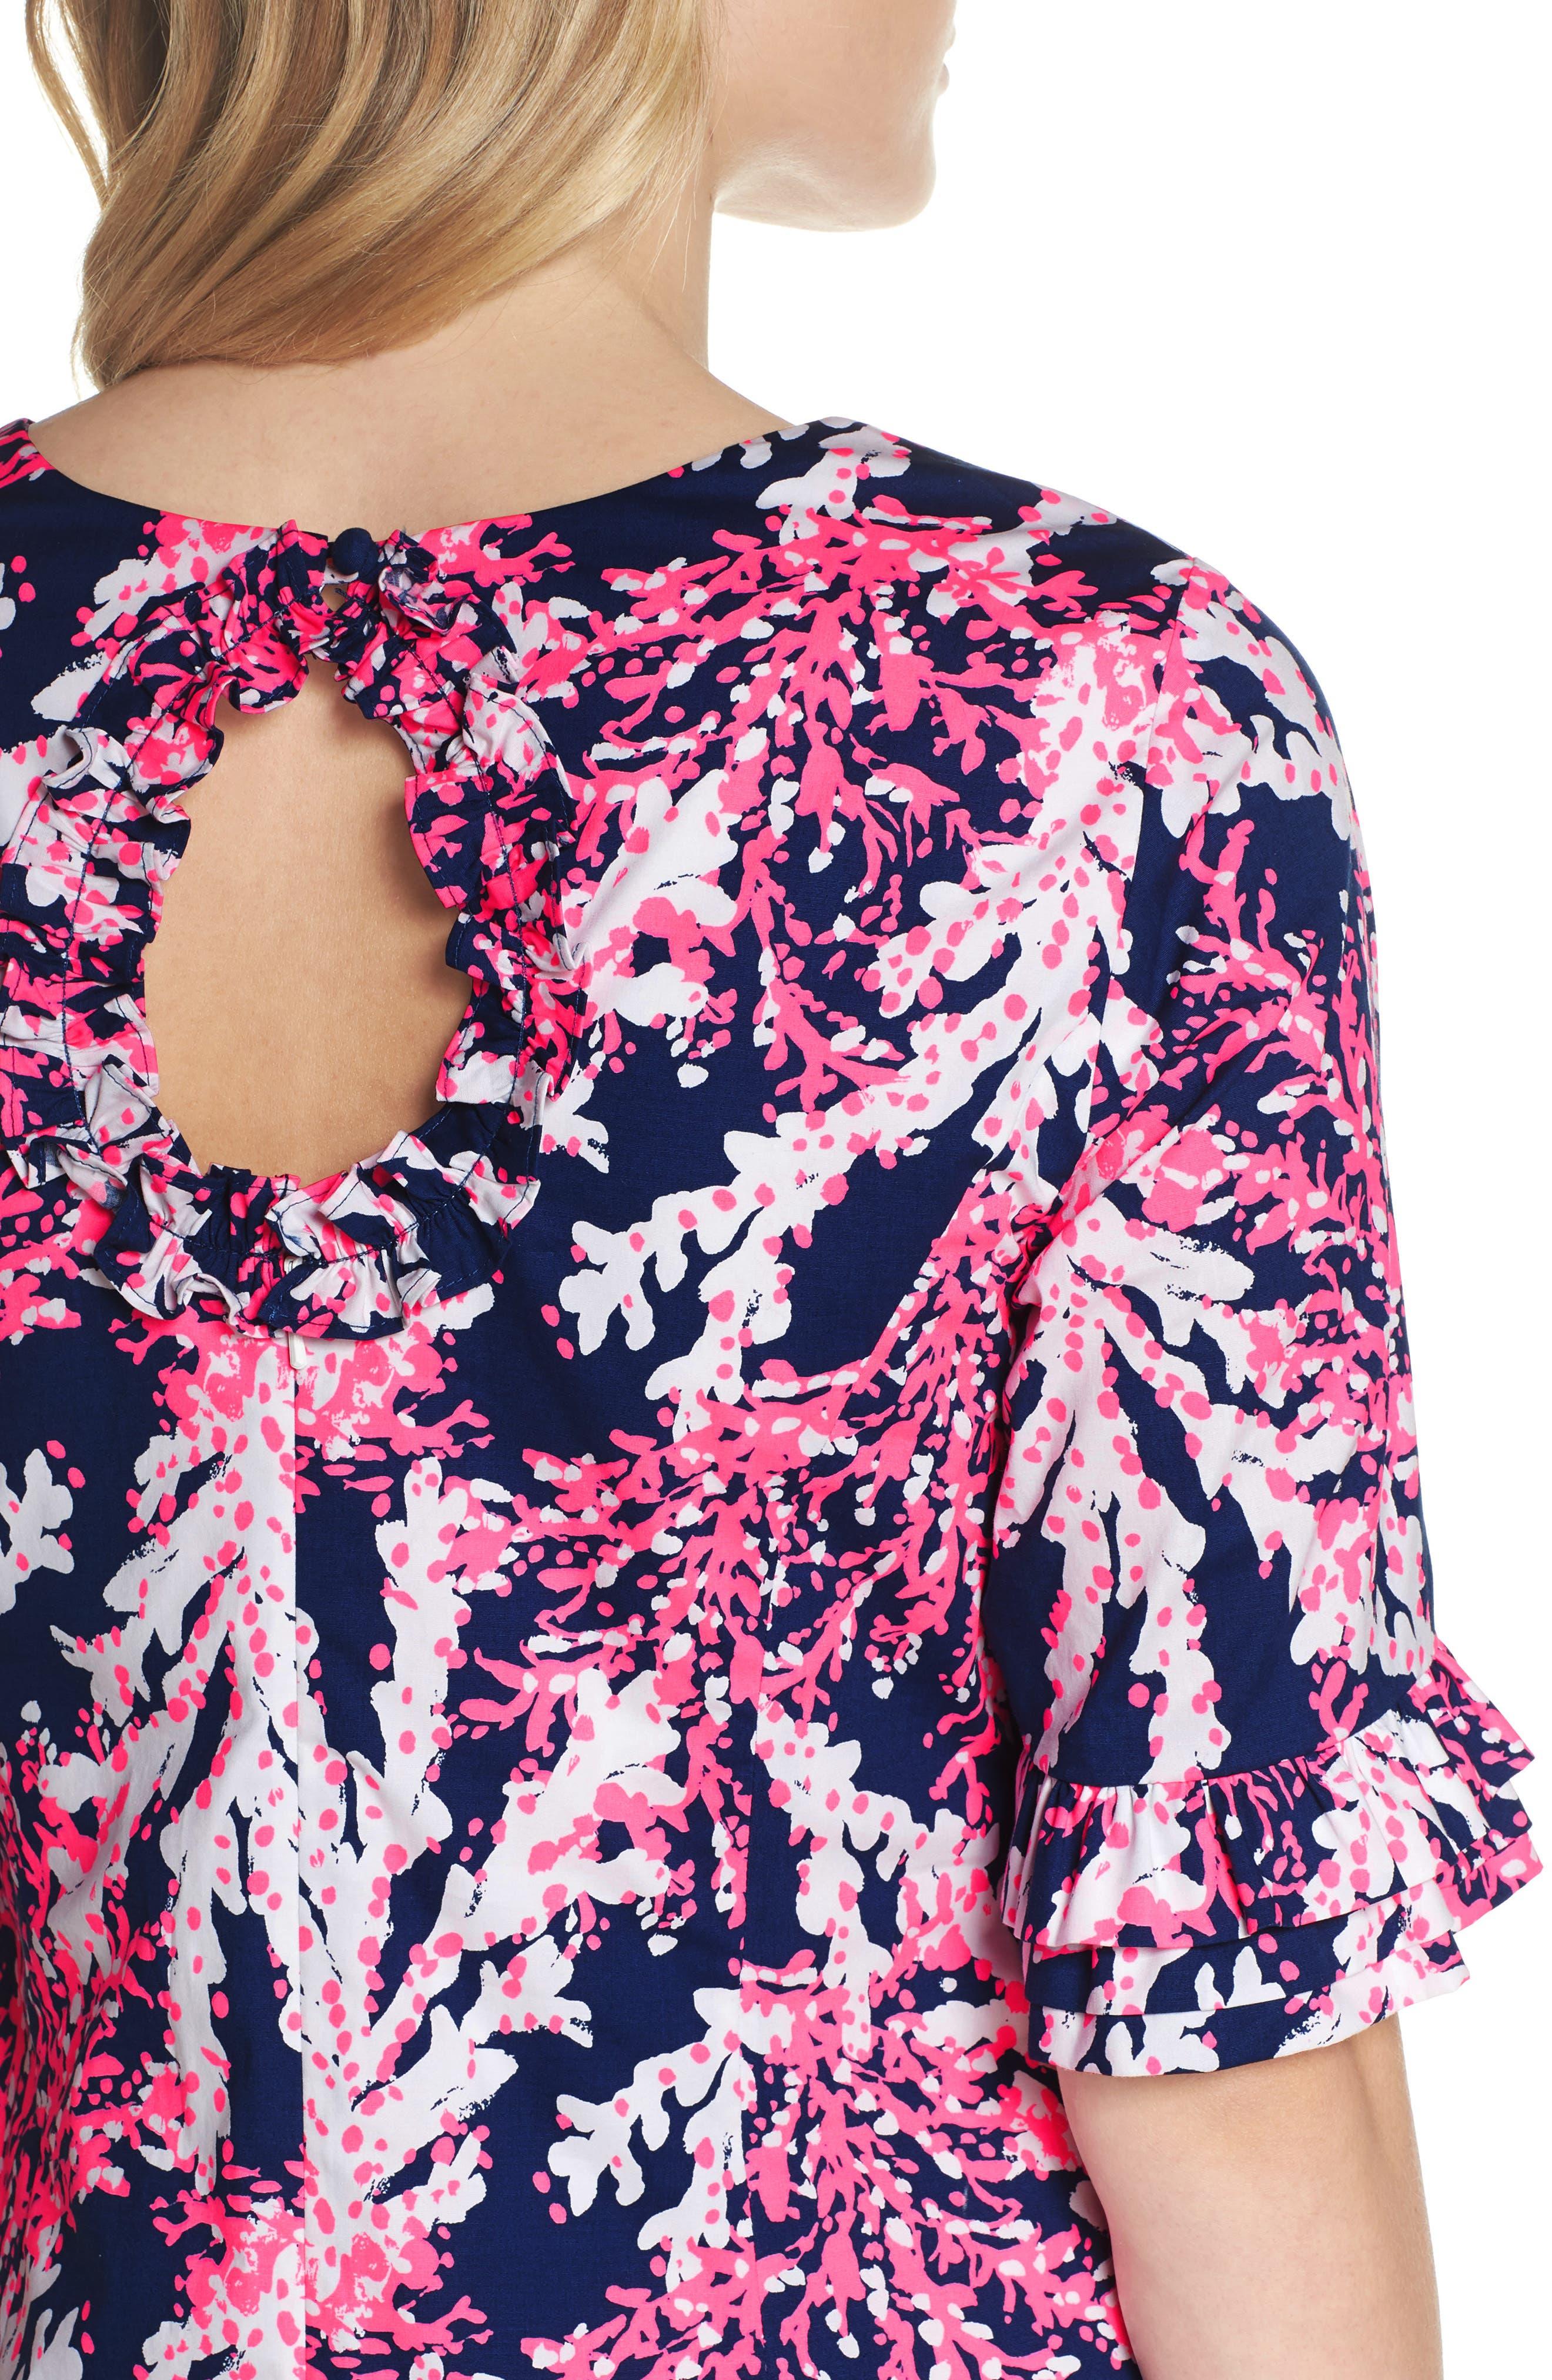 Fiesta Stretch Sheath Dress,                             Alternate thumbnail 4, color,                             NAUTI NAVY BEYOND THE SEA